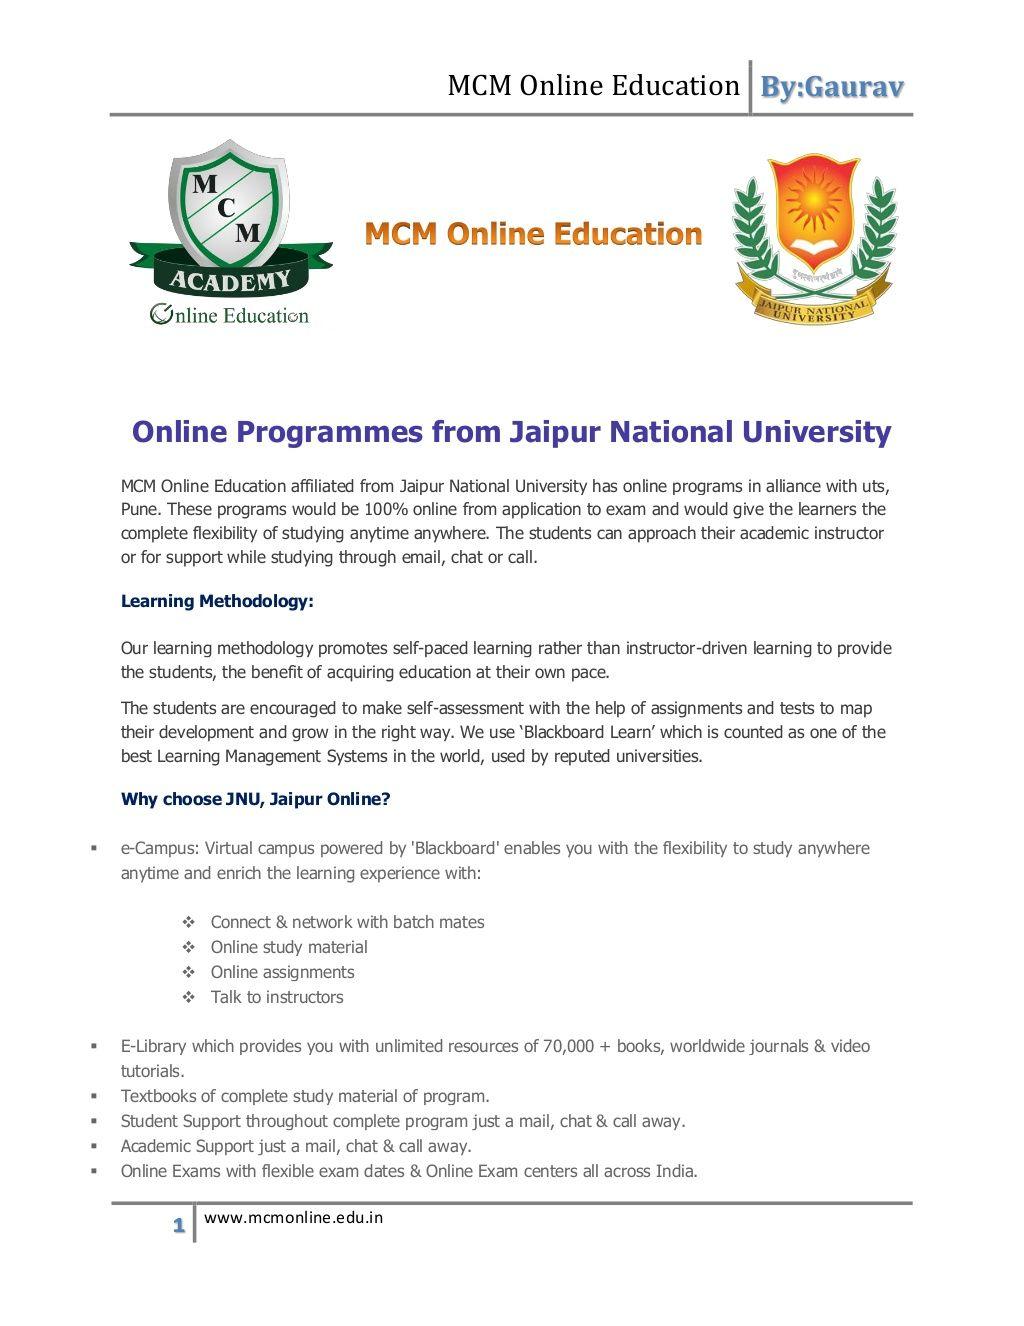 Jaipur national university,jaipur by MCM Online Education via